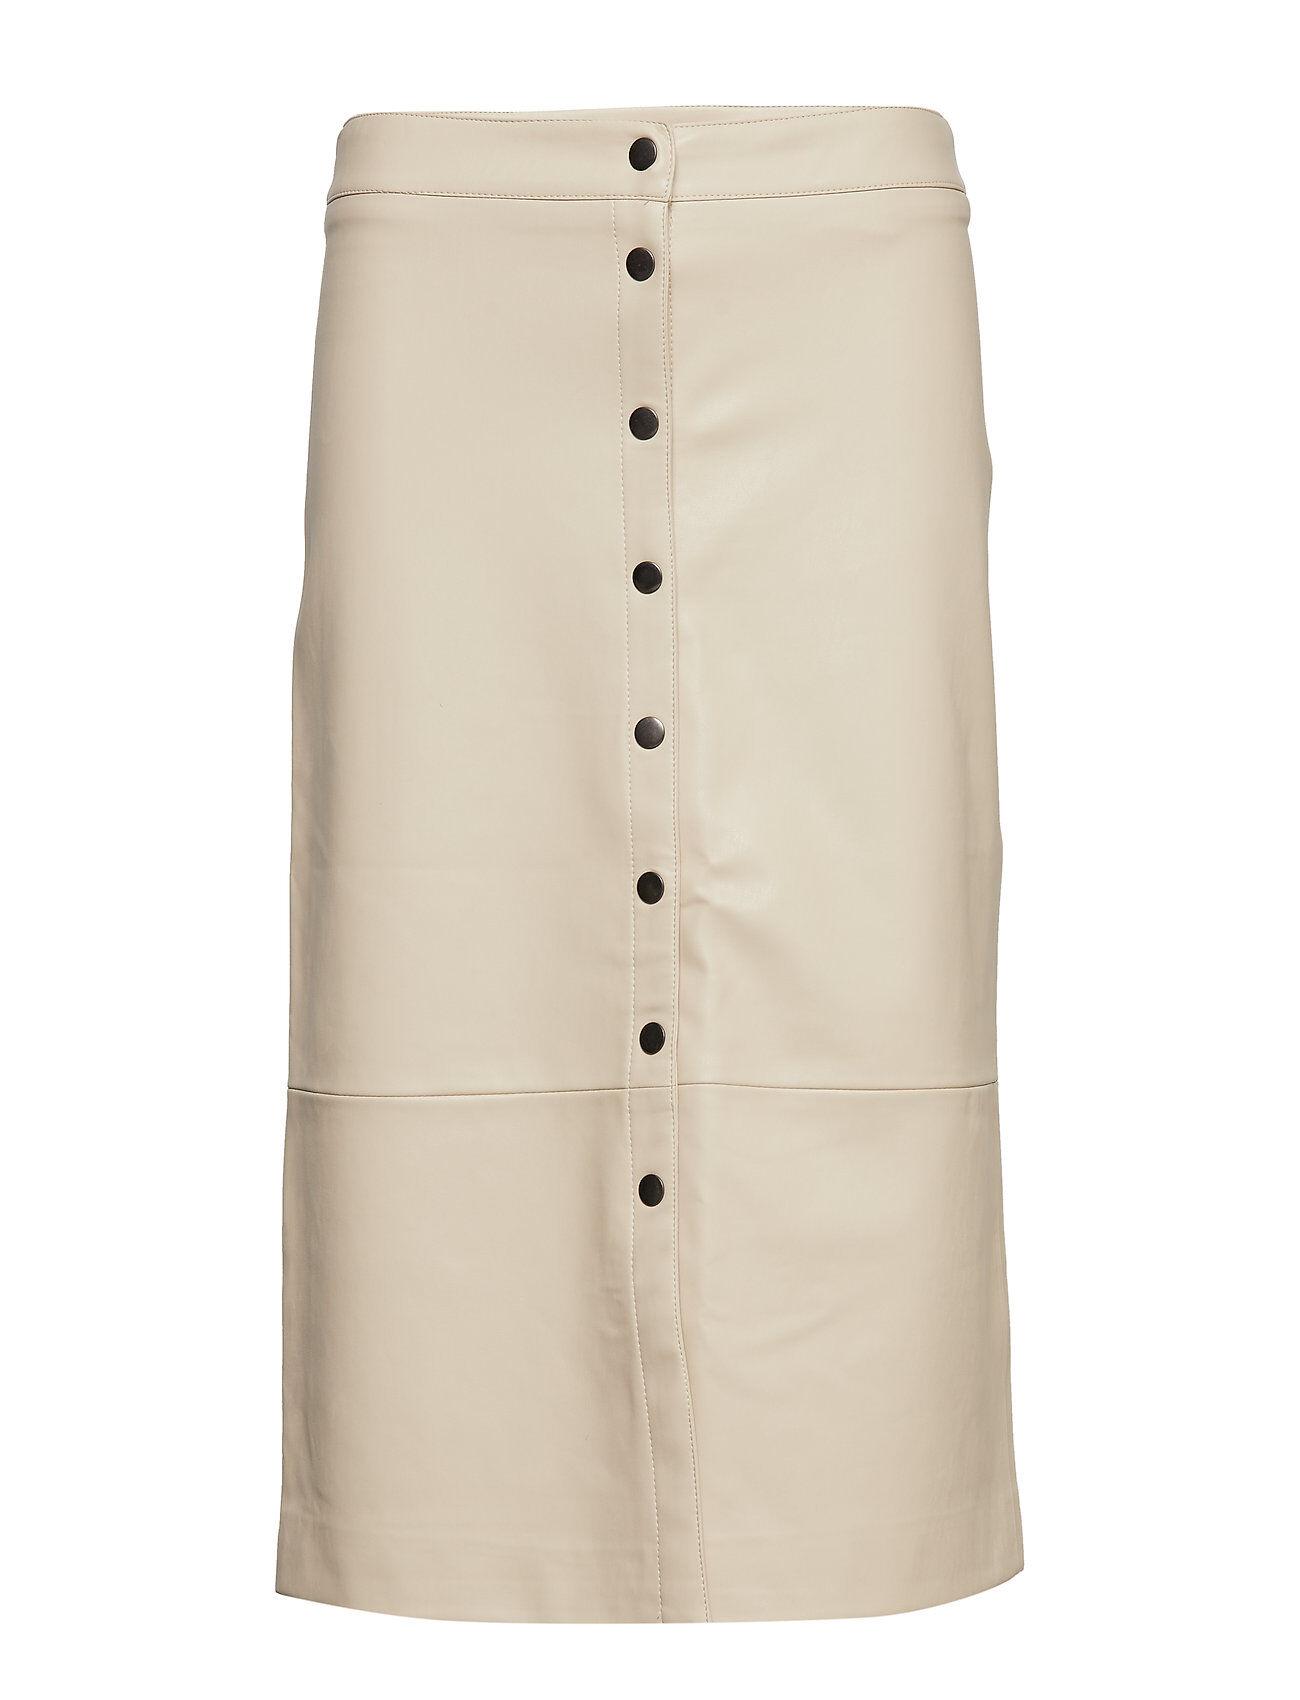 Gina Tricot Ariel Skirt